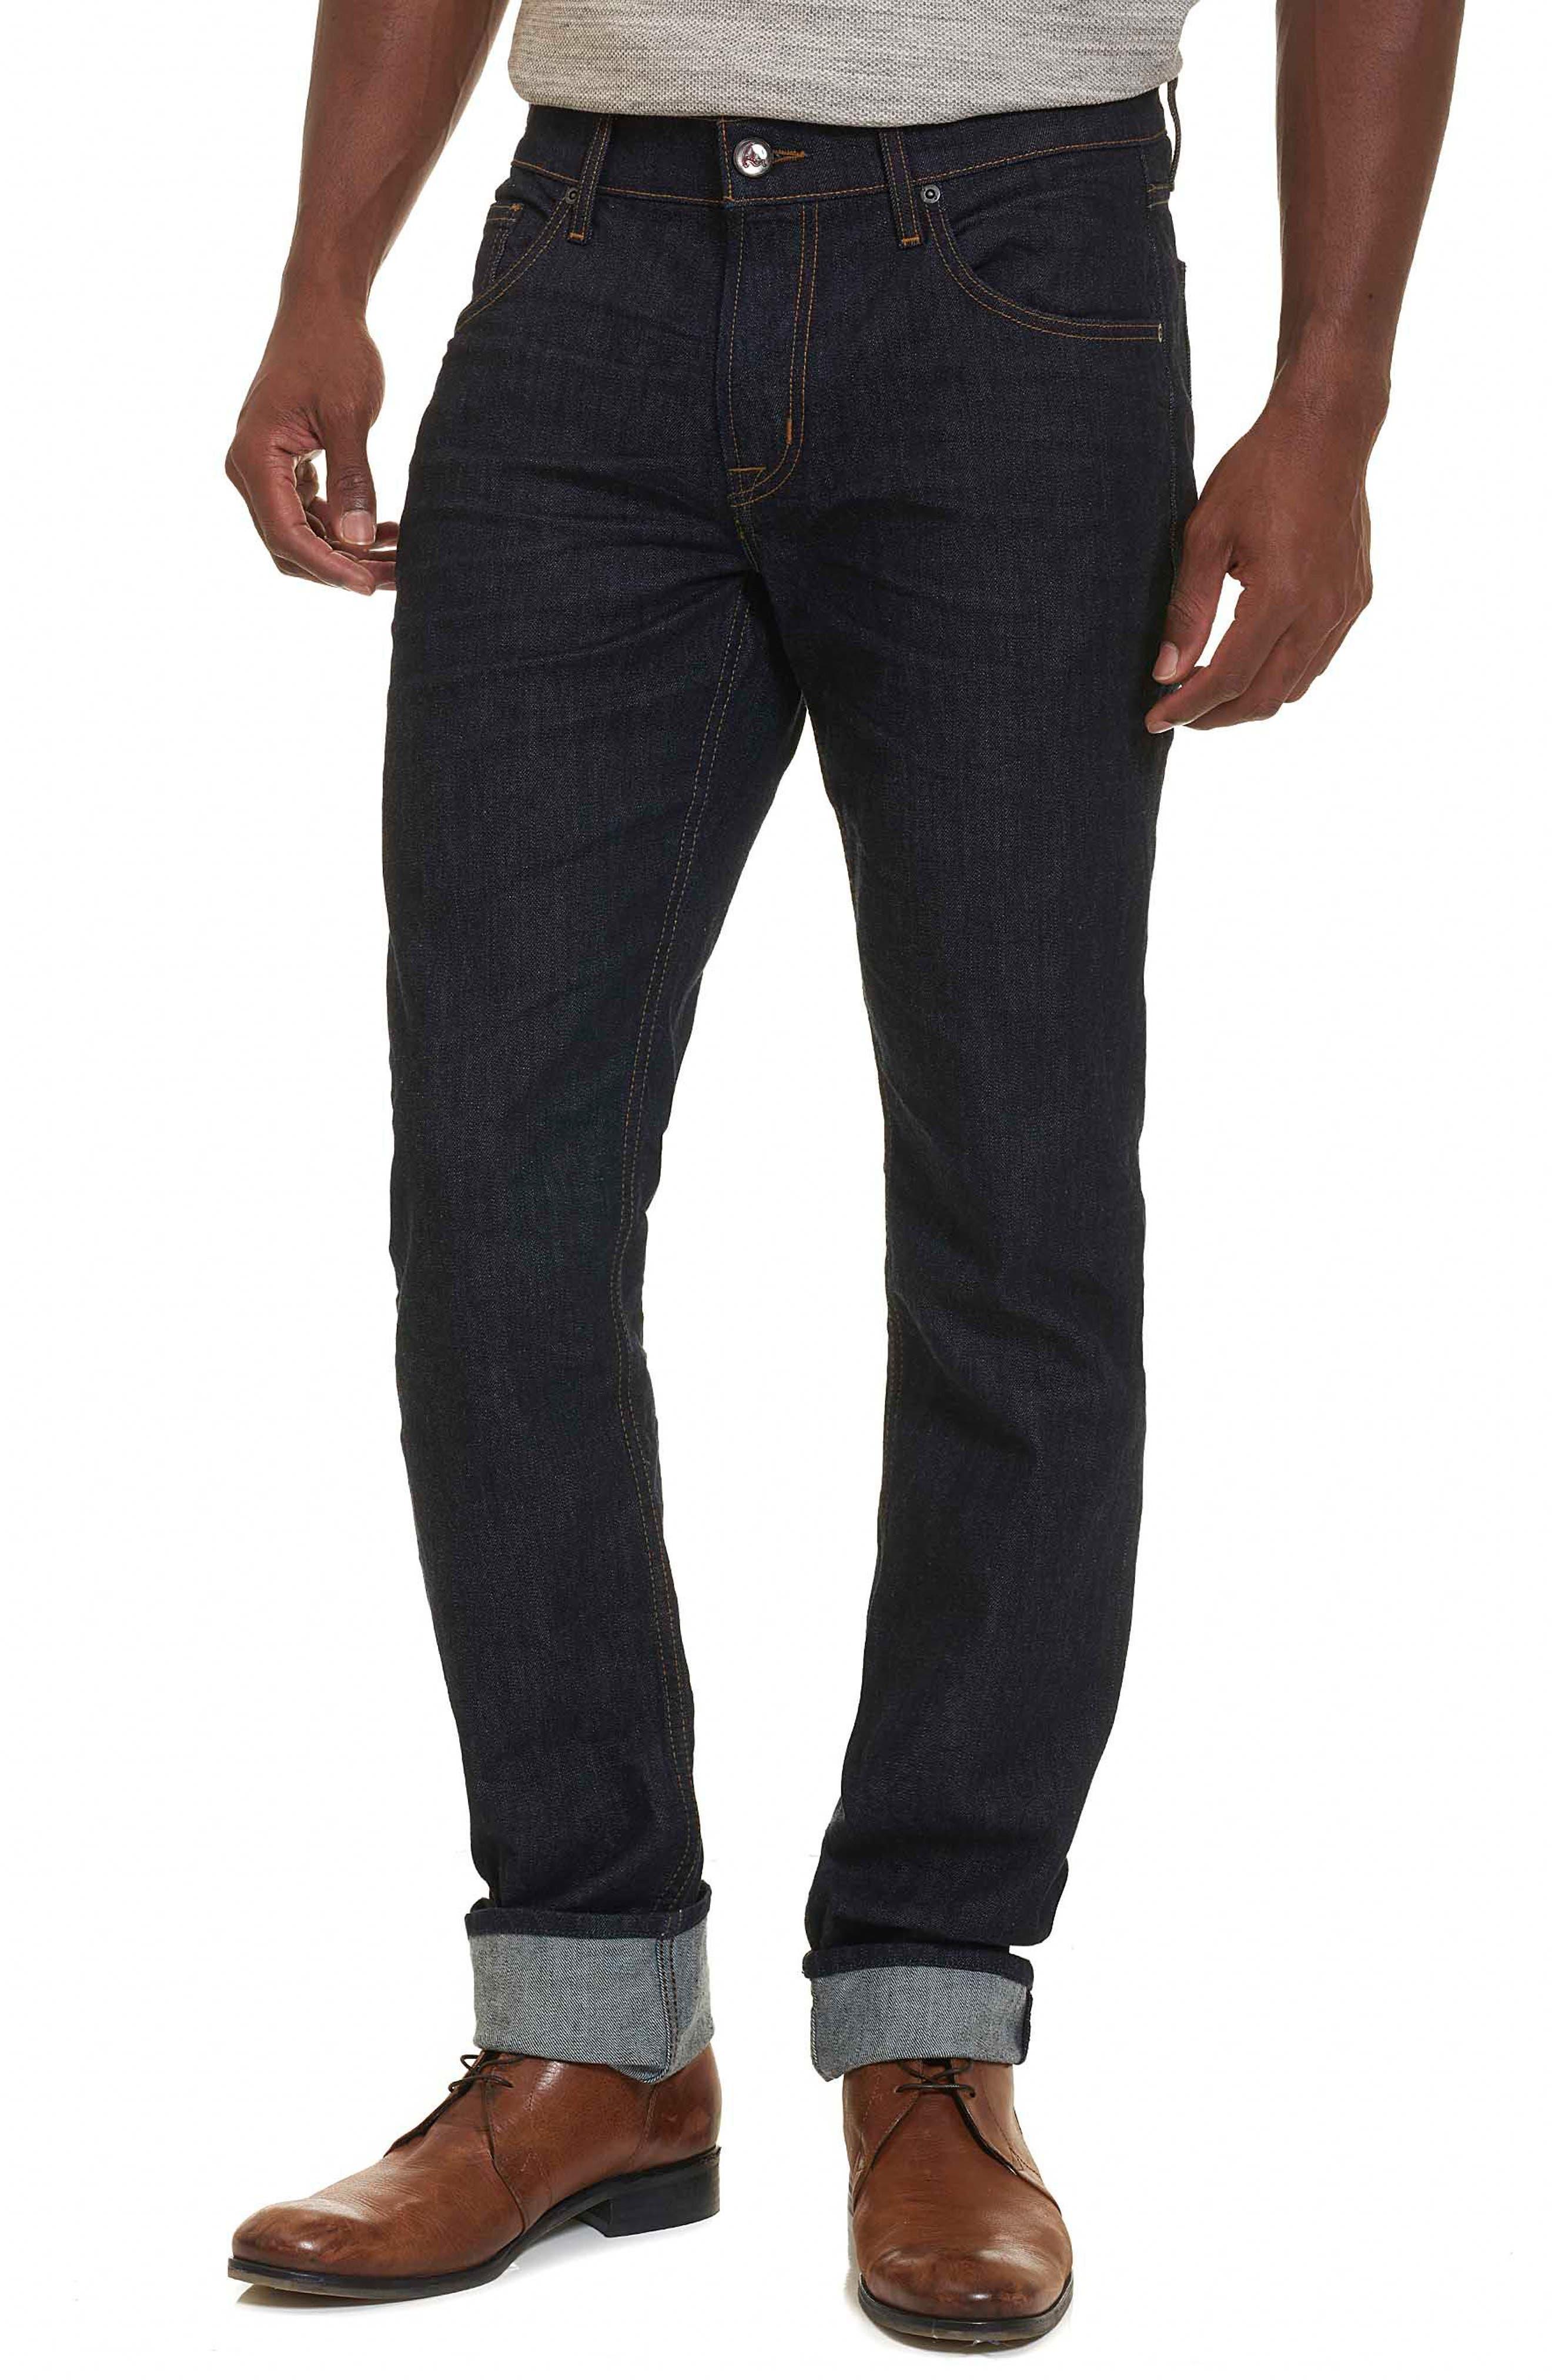 ROBERT GRAHAM Resist Classic Fit Jeans